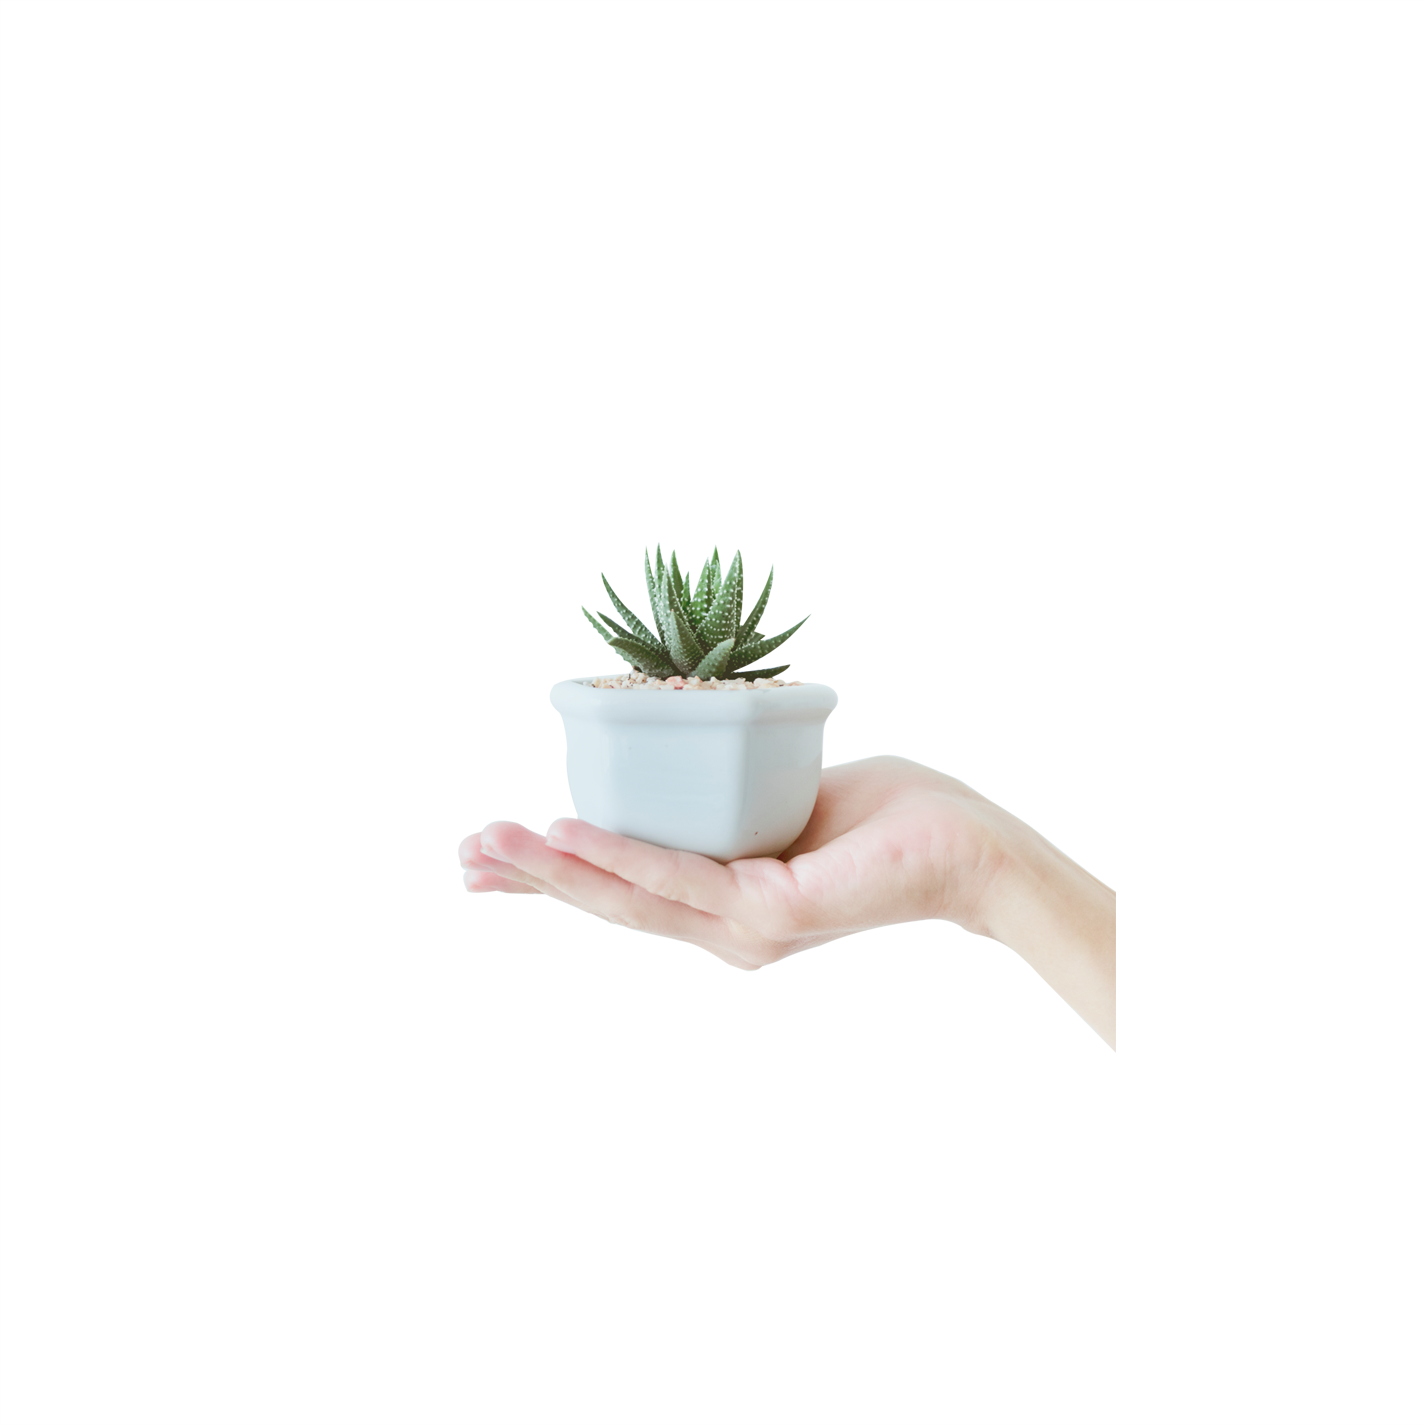 growth-image-3